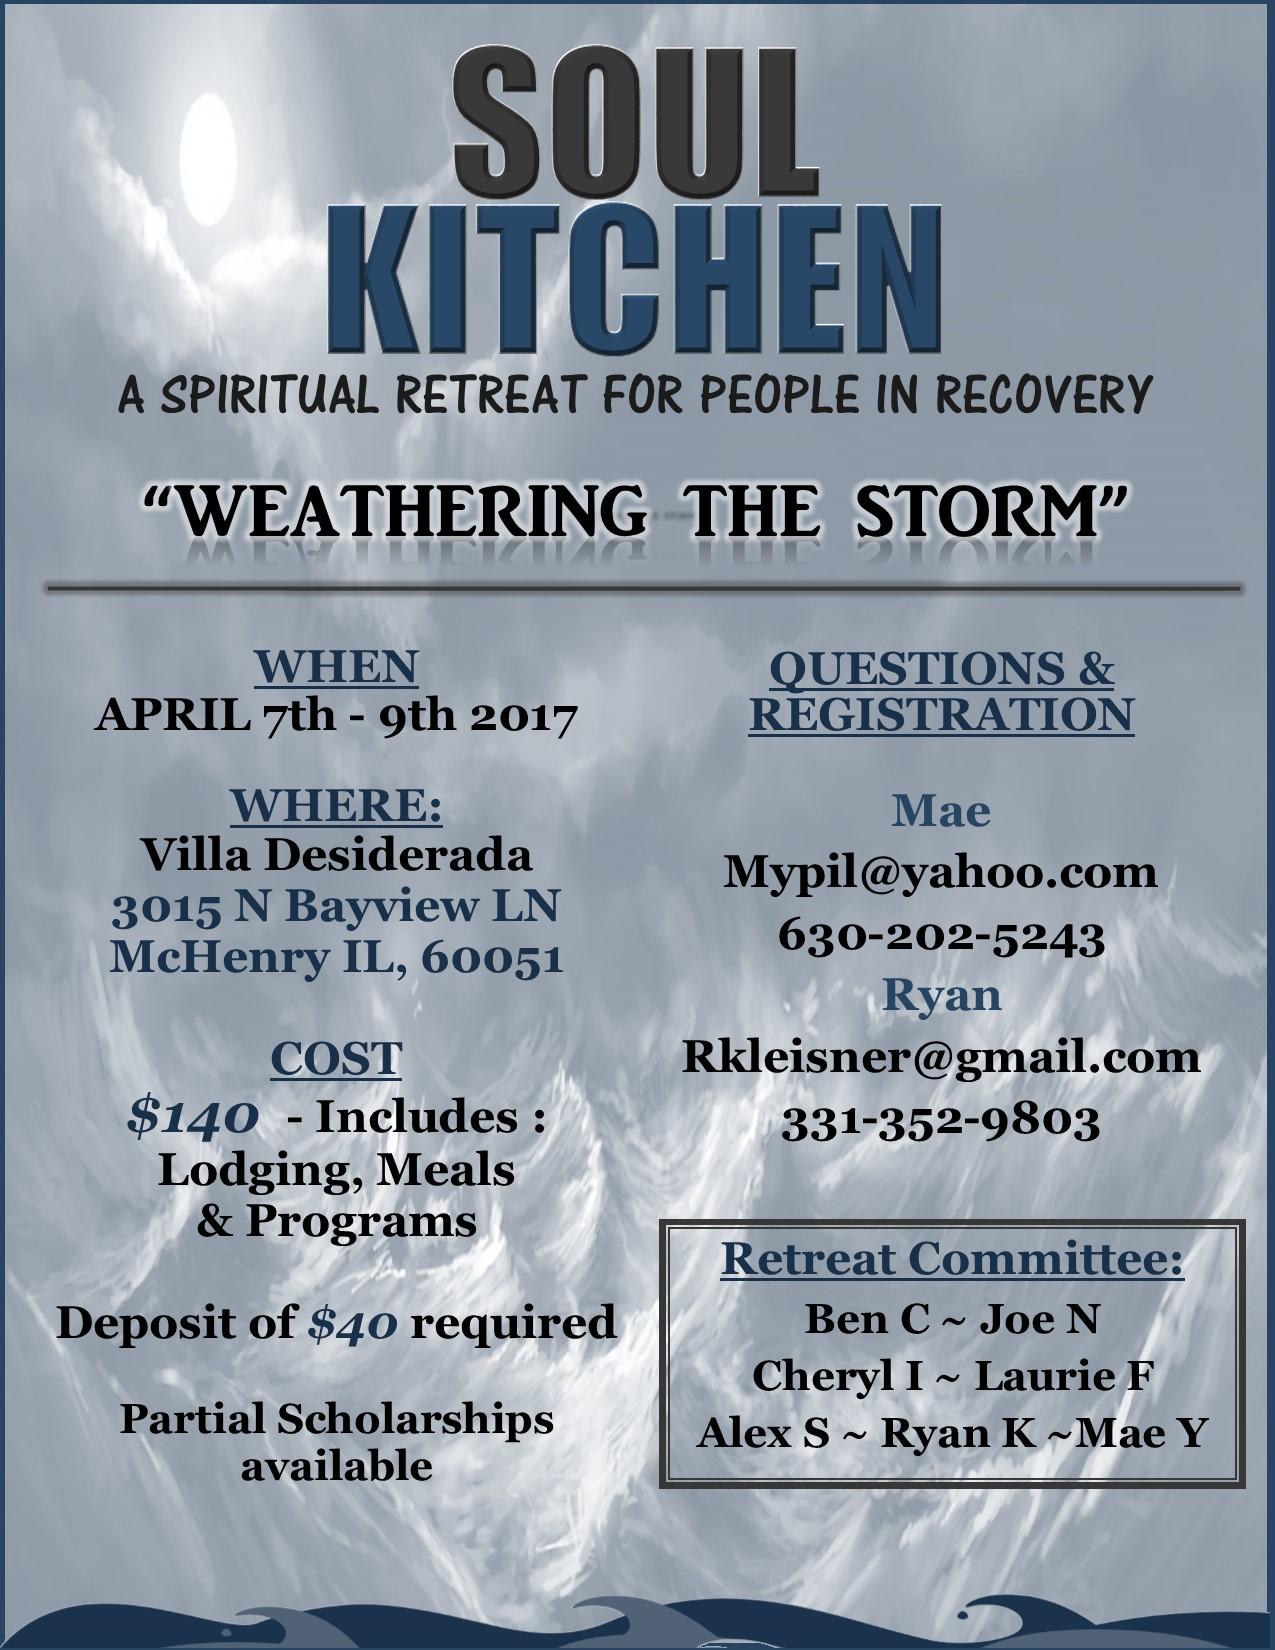 The Soul Kitchen Retreat: Spring 2017 1